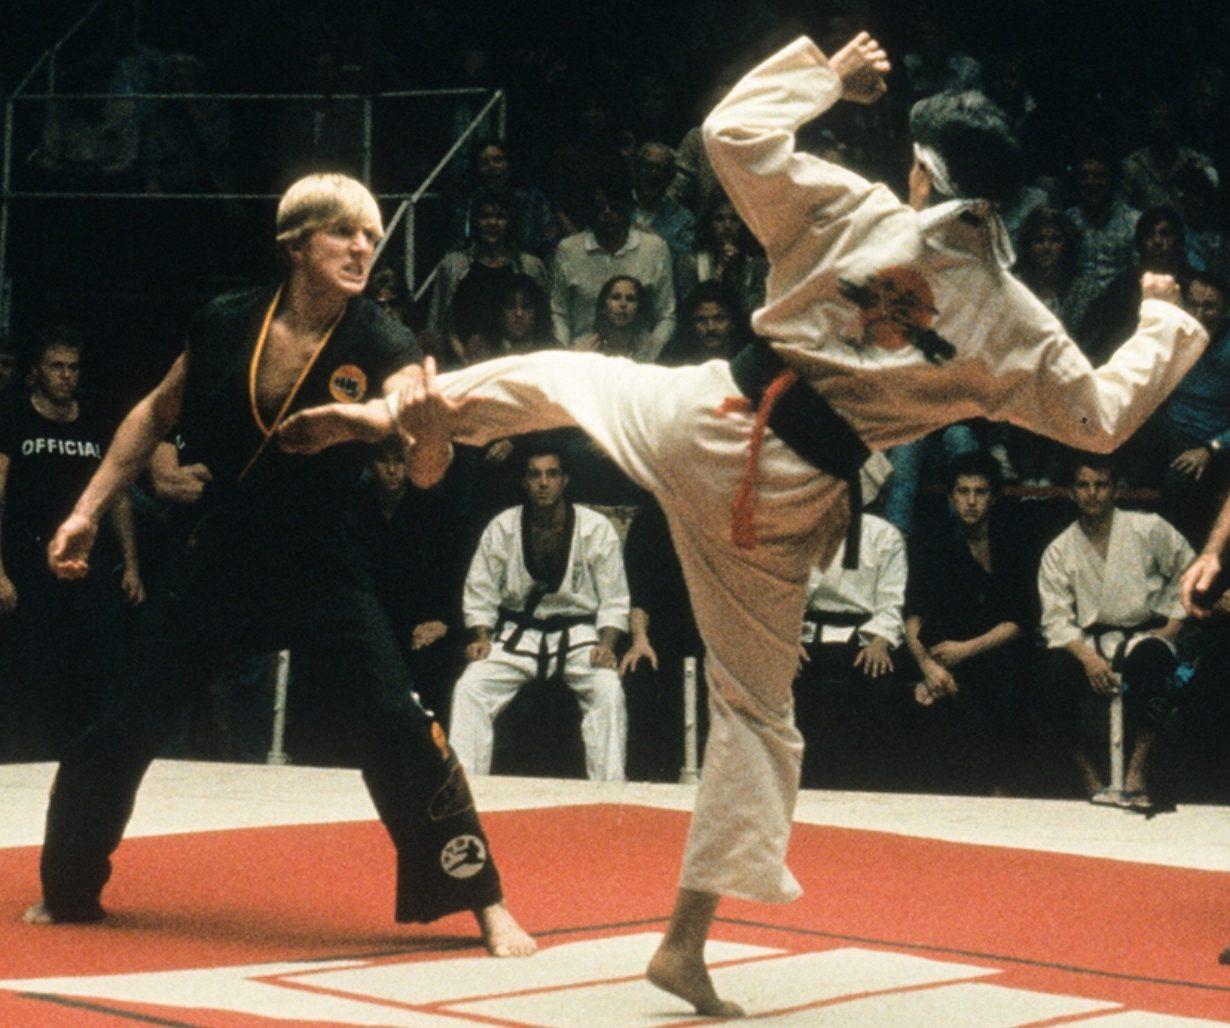 twgzehml2wqdyvdzdncg e1604487458773 20 Secret Facts About The Karate Kid